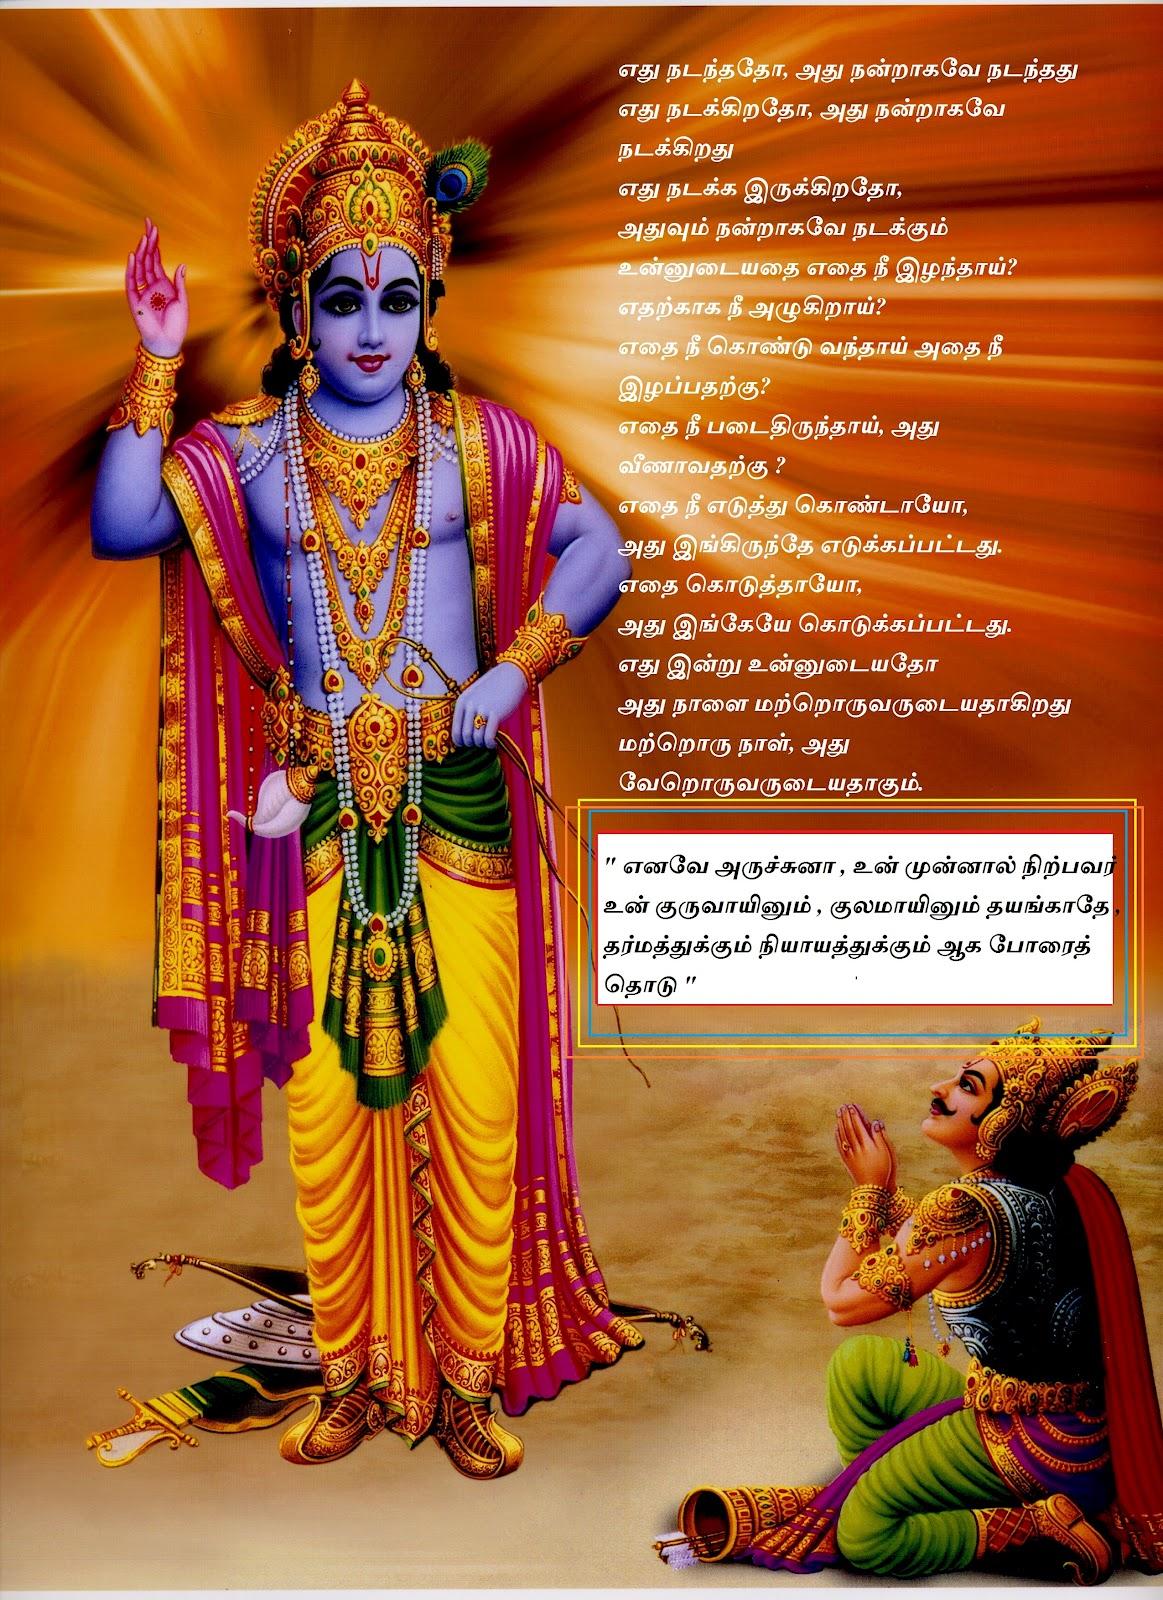 Bhagavad-gita as it is original 1972 edition free pdf download.